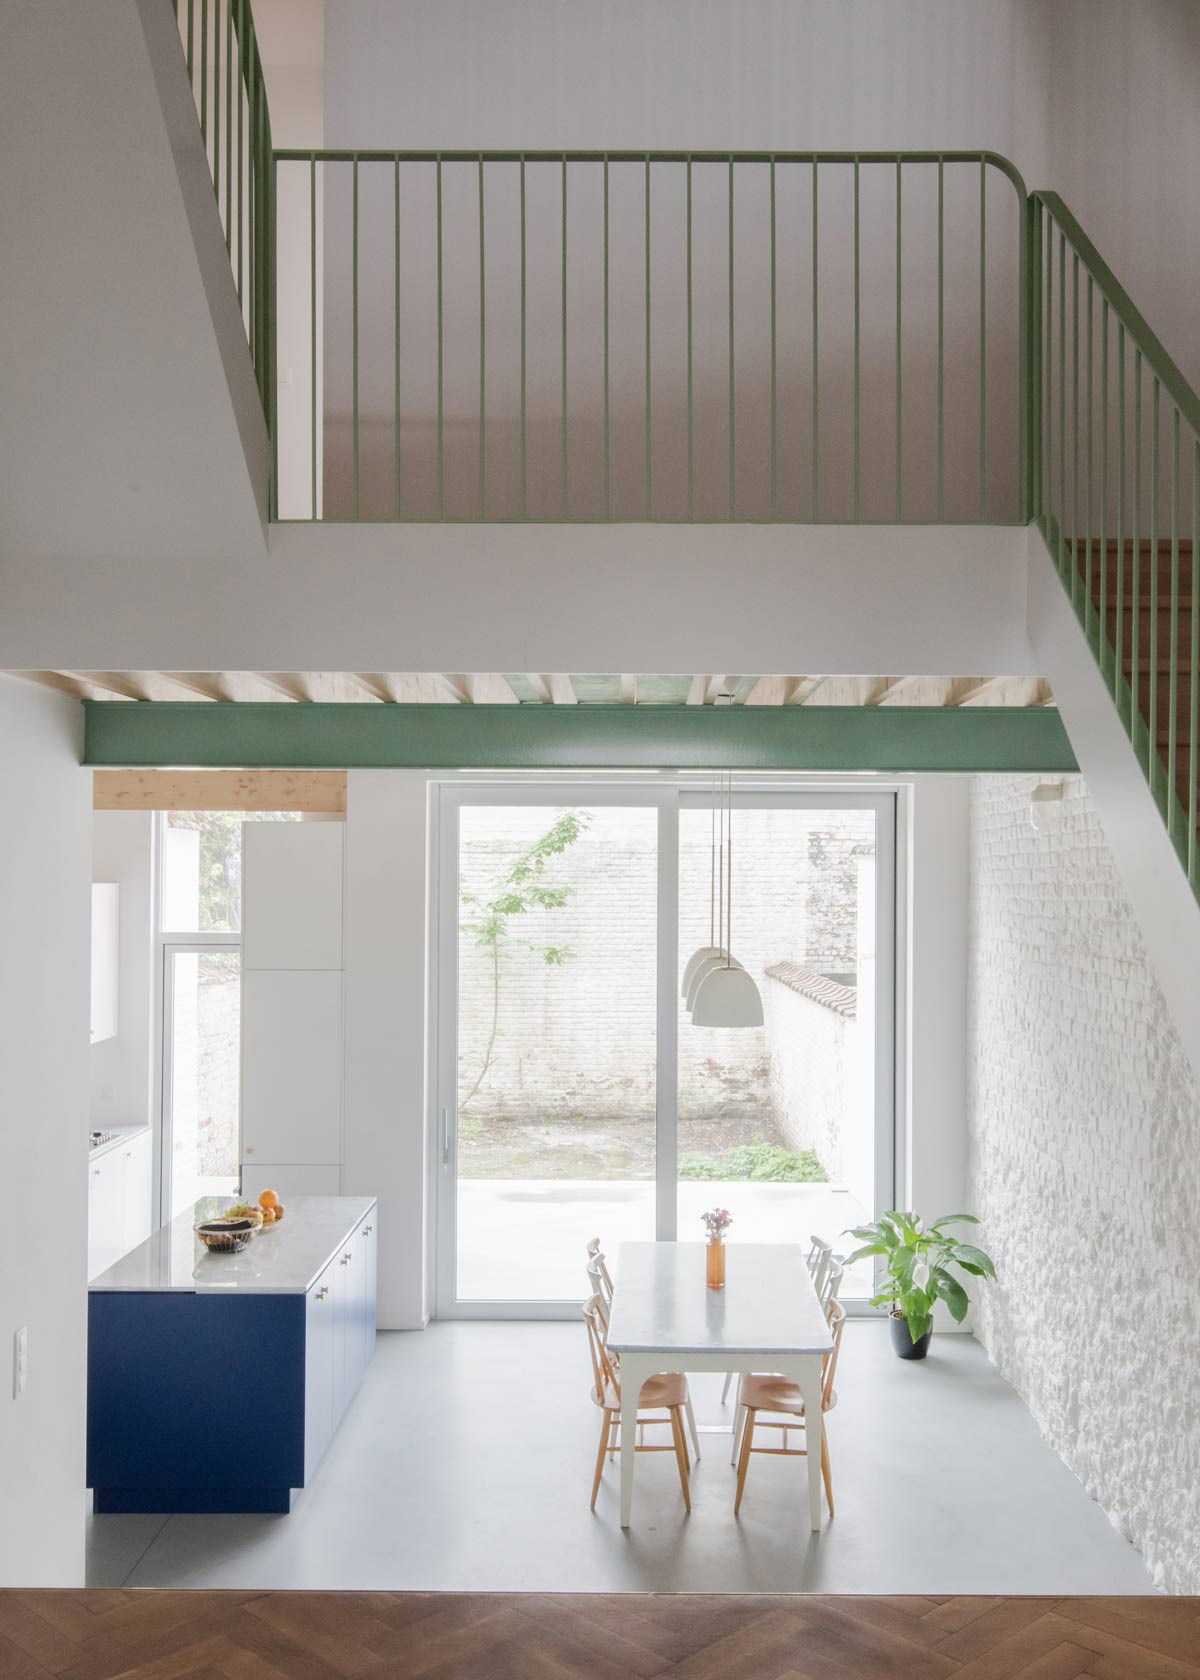 focus-archi-magazine-bruxelles-renovation-interieur.jpg